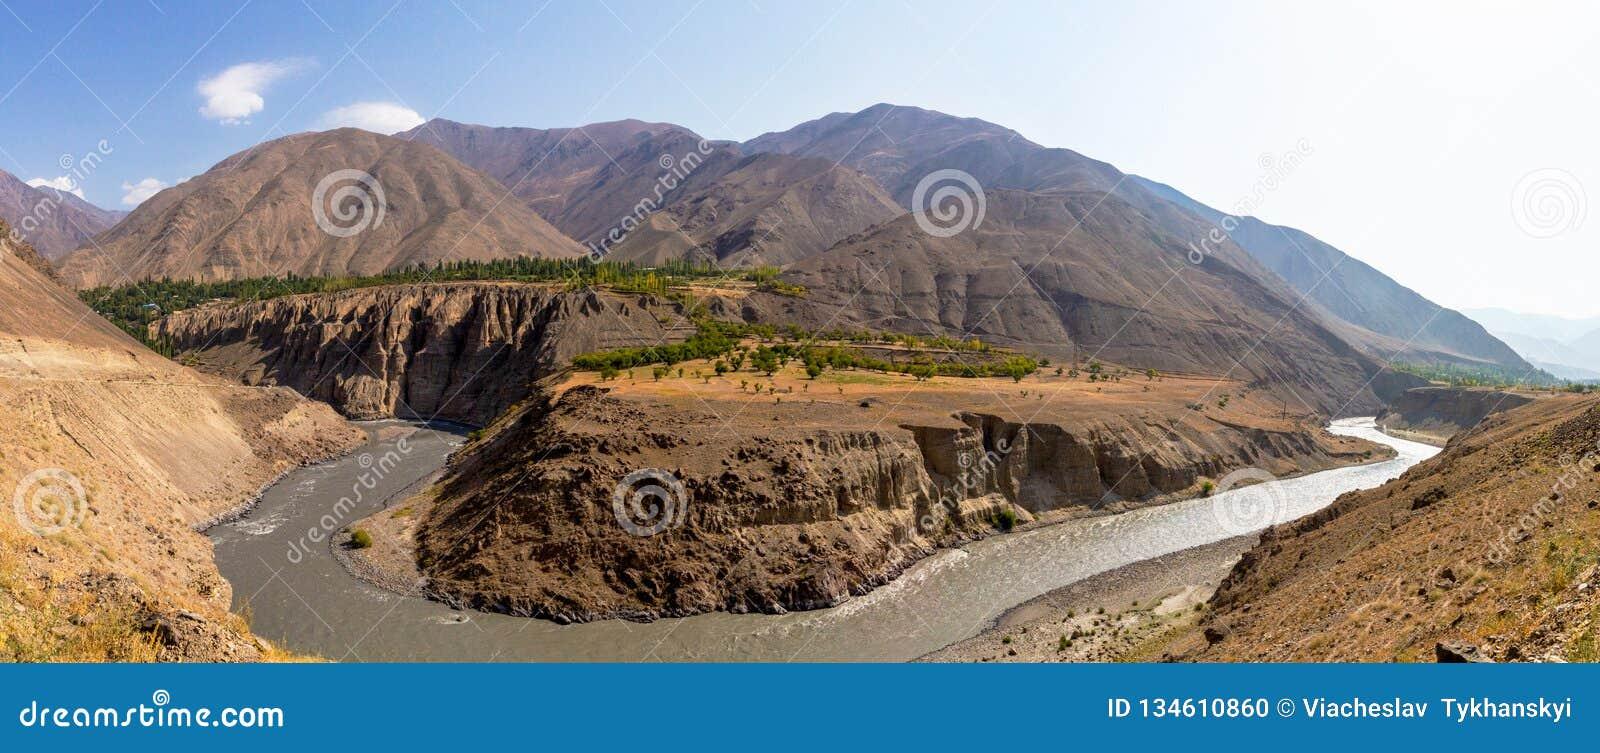 Hermosa vista del lago Yashikul en Pamir en Tayikistán